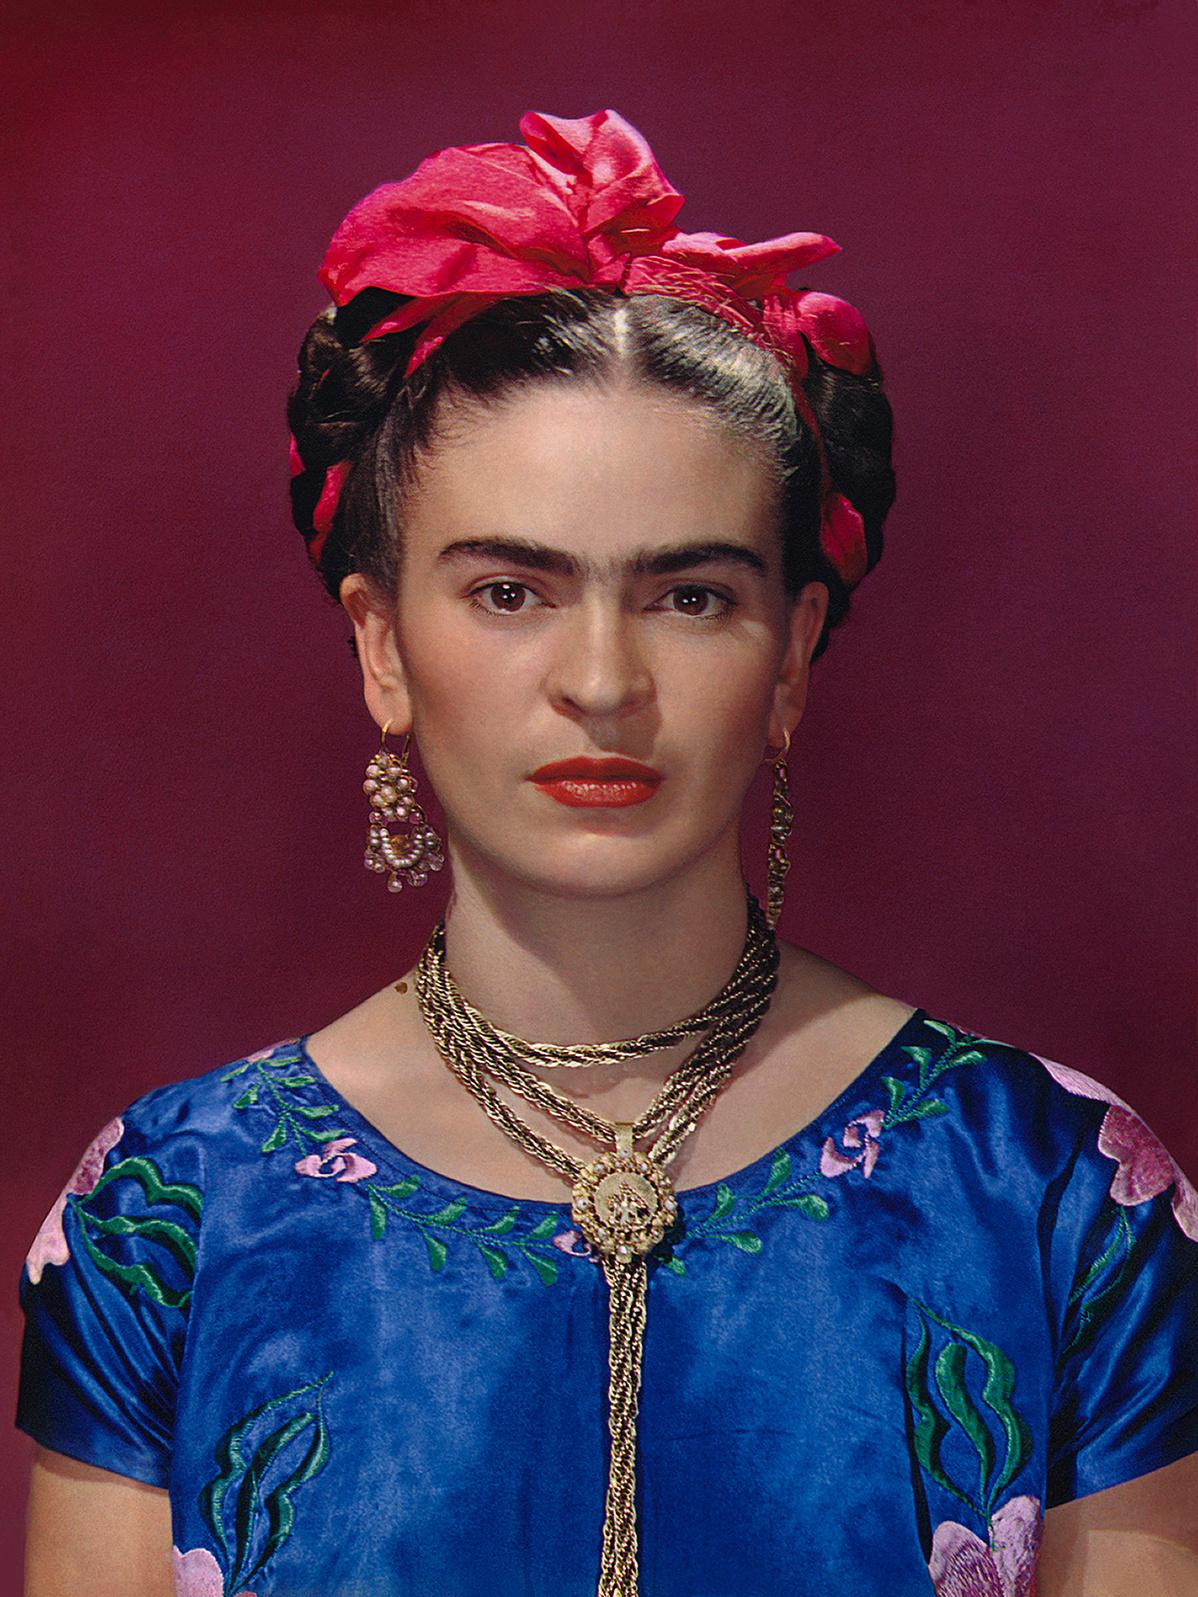 FridaKahloinbluesatinblouse1939PhotographNickolasMurayCNickolasMurayPhotoArchives-160815.jpg